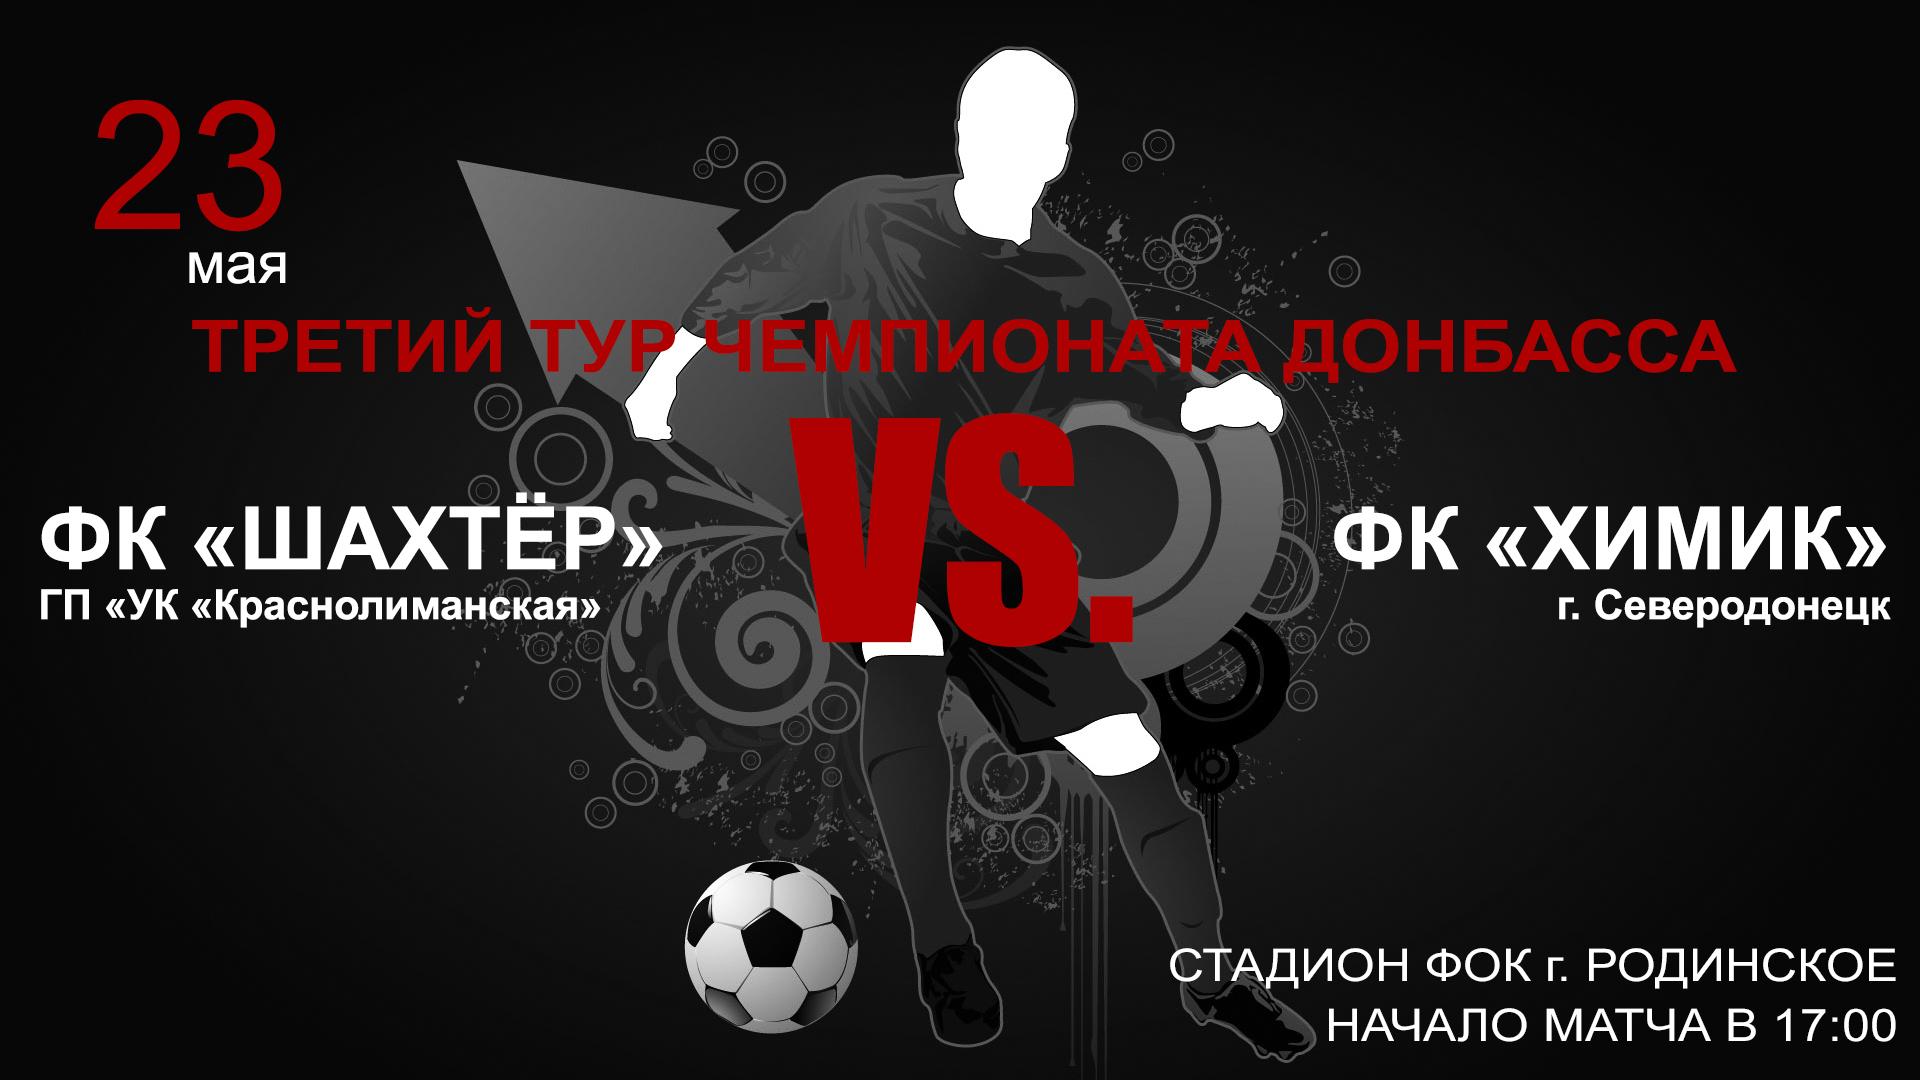 Третий тур Чемпионата Донбасса по футболу